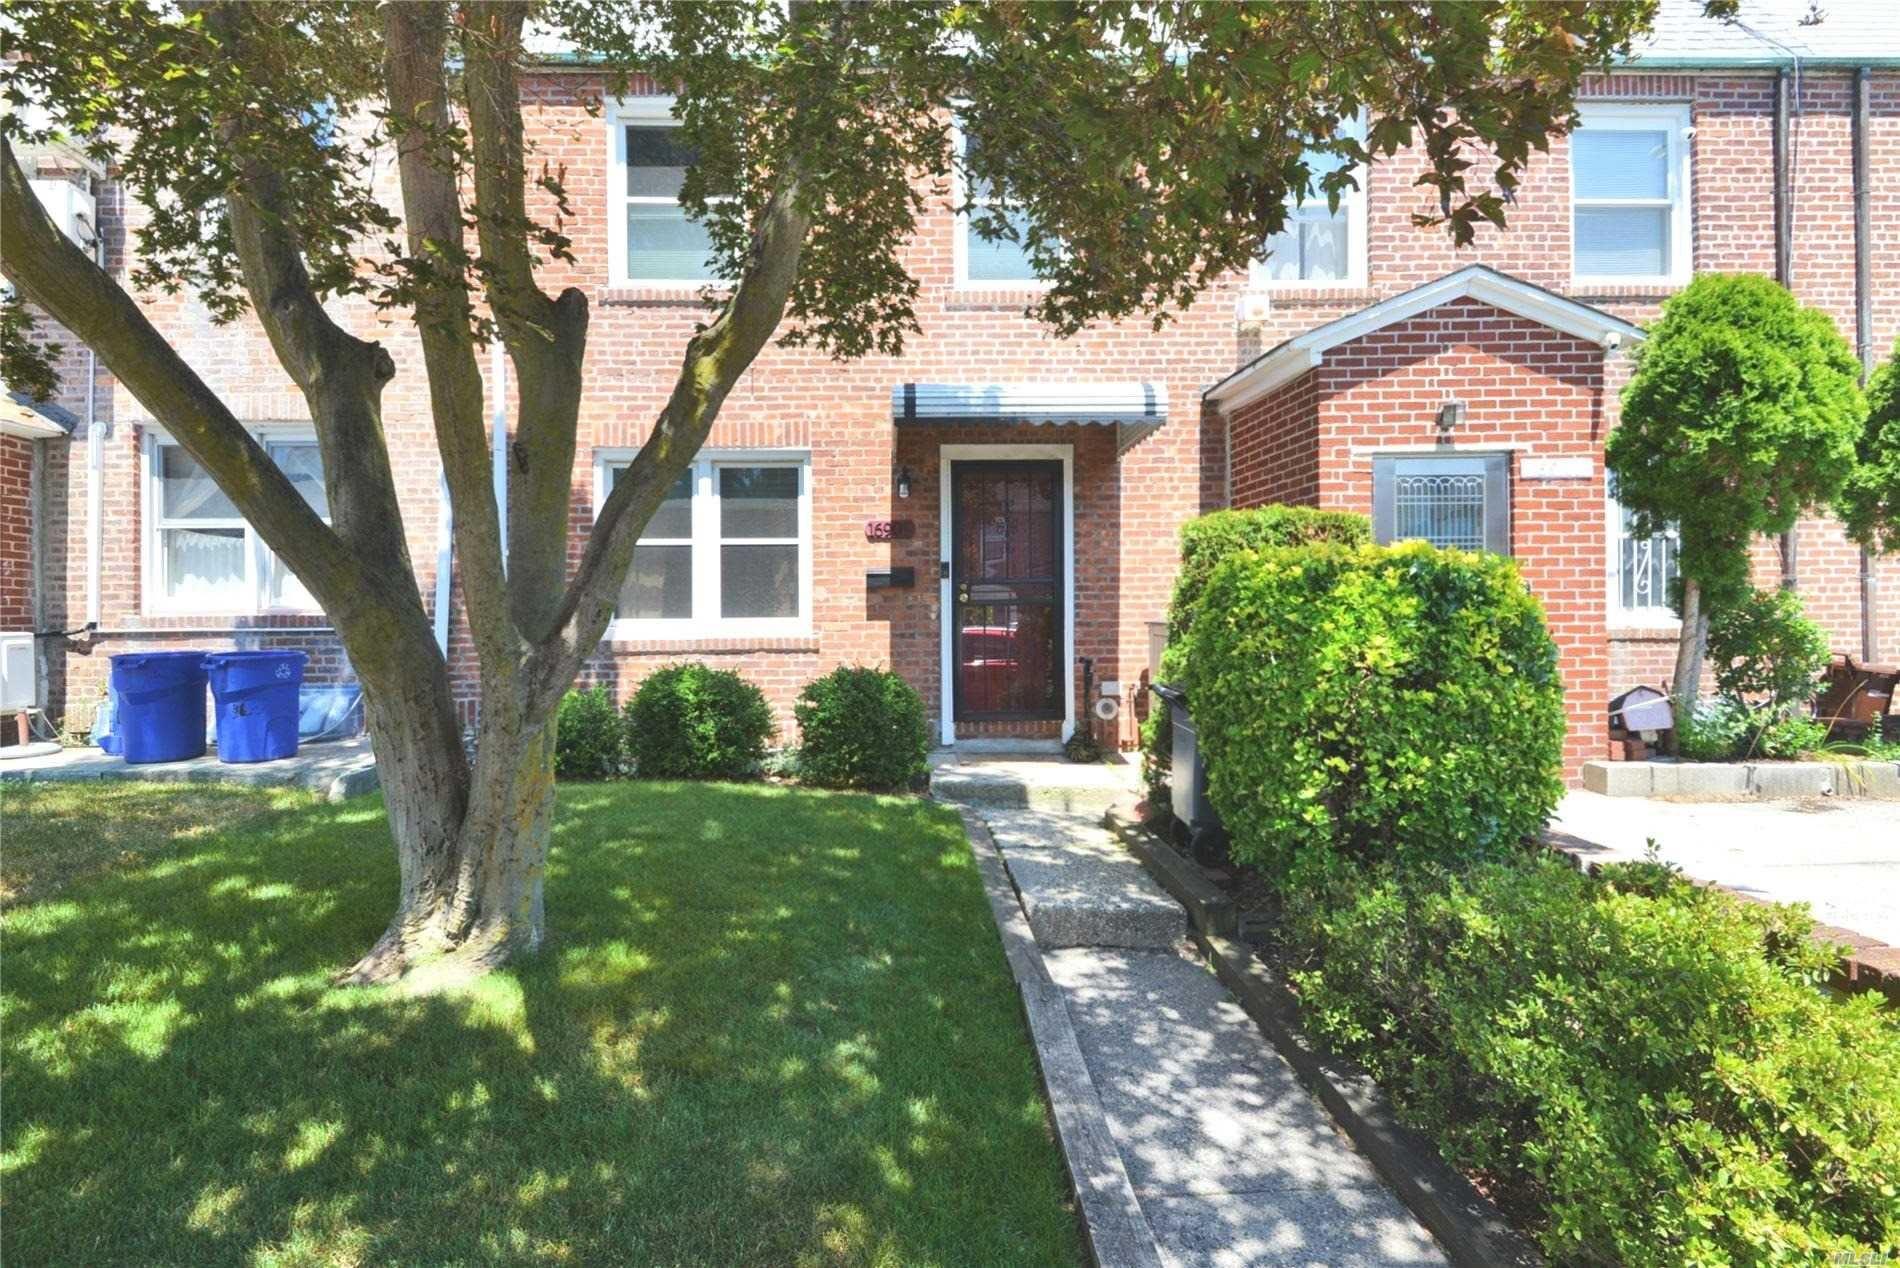 169-09 22 Avenue, Whitestone, NY 11357 - MLS#: 3234345